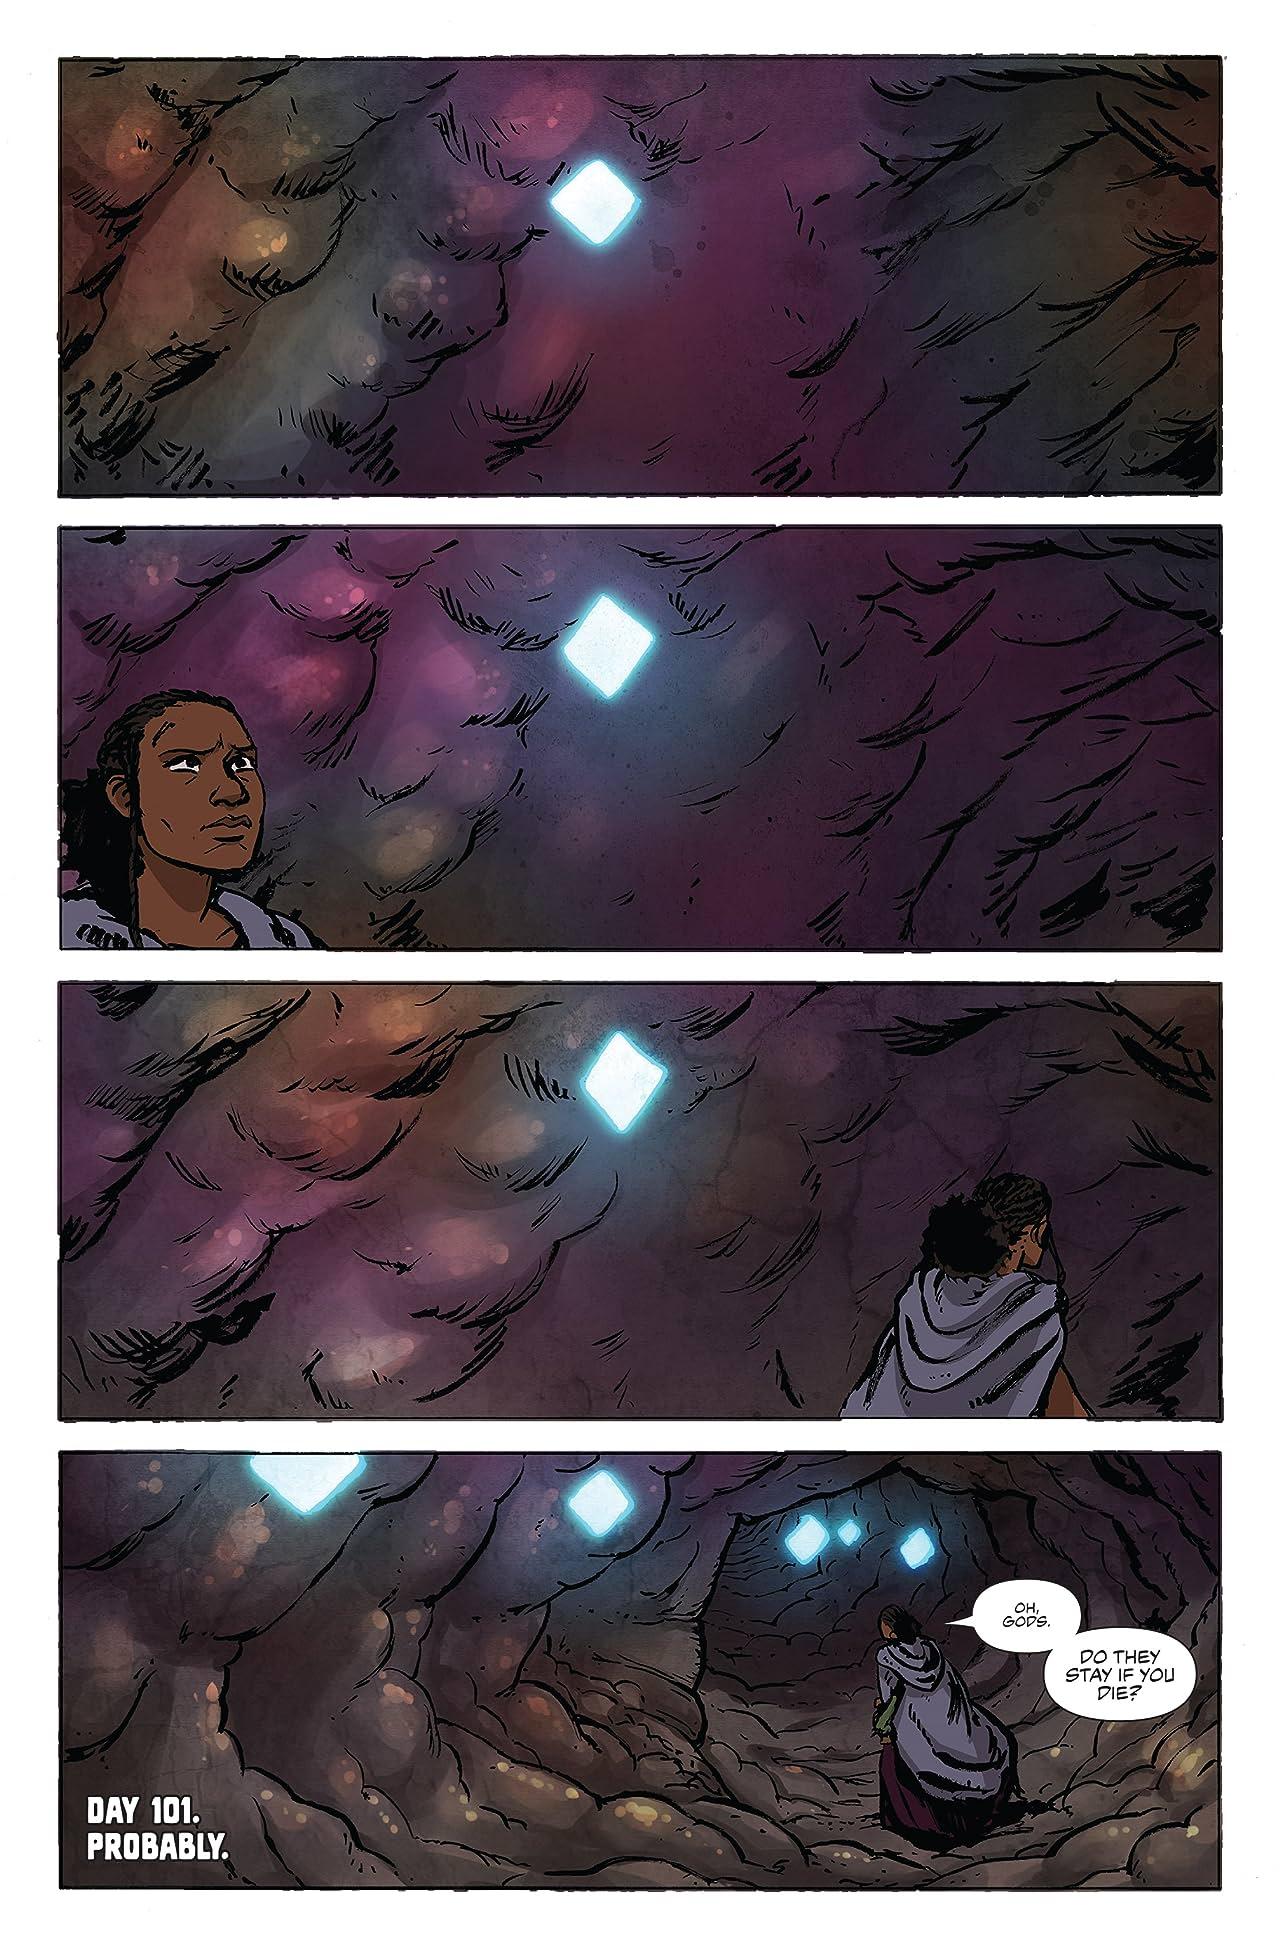 Delver Season One (comiXology Originals) #5 (of 5)